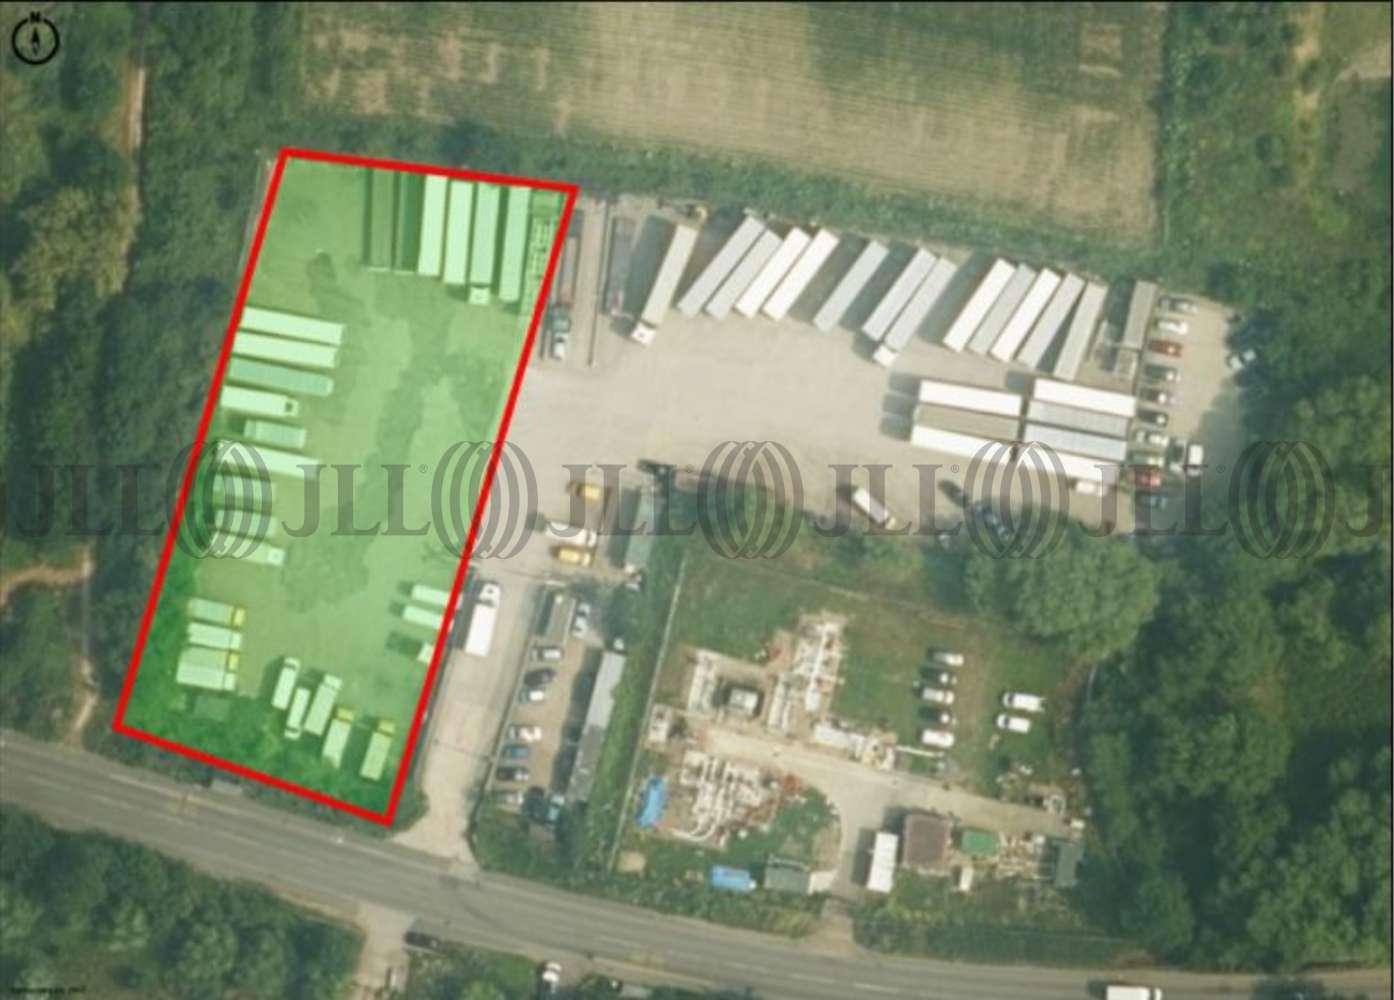 Industrial Colnbrook, UB7 OEW - Parrs Yard